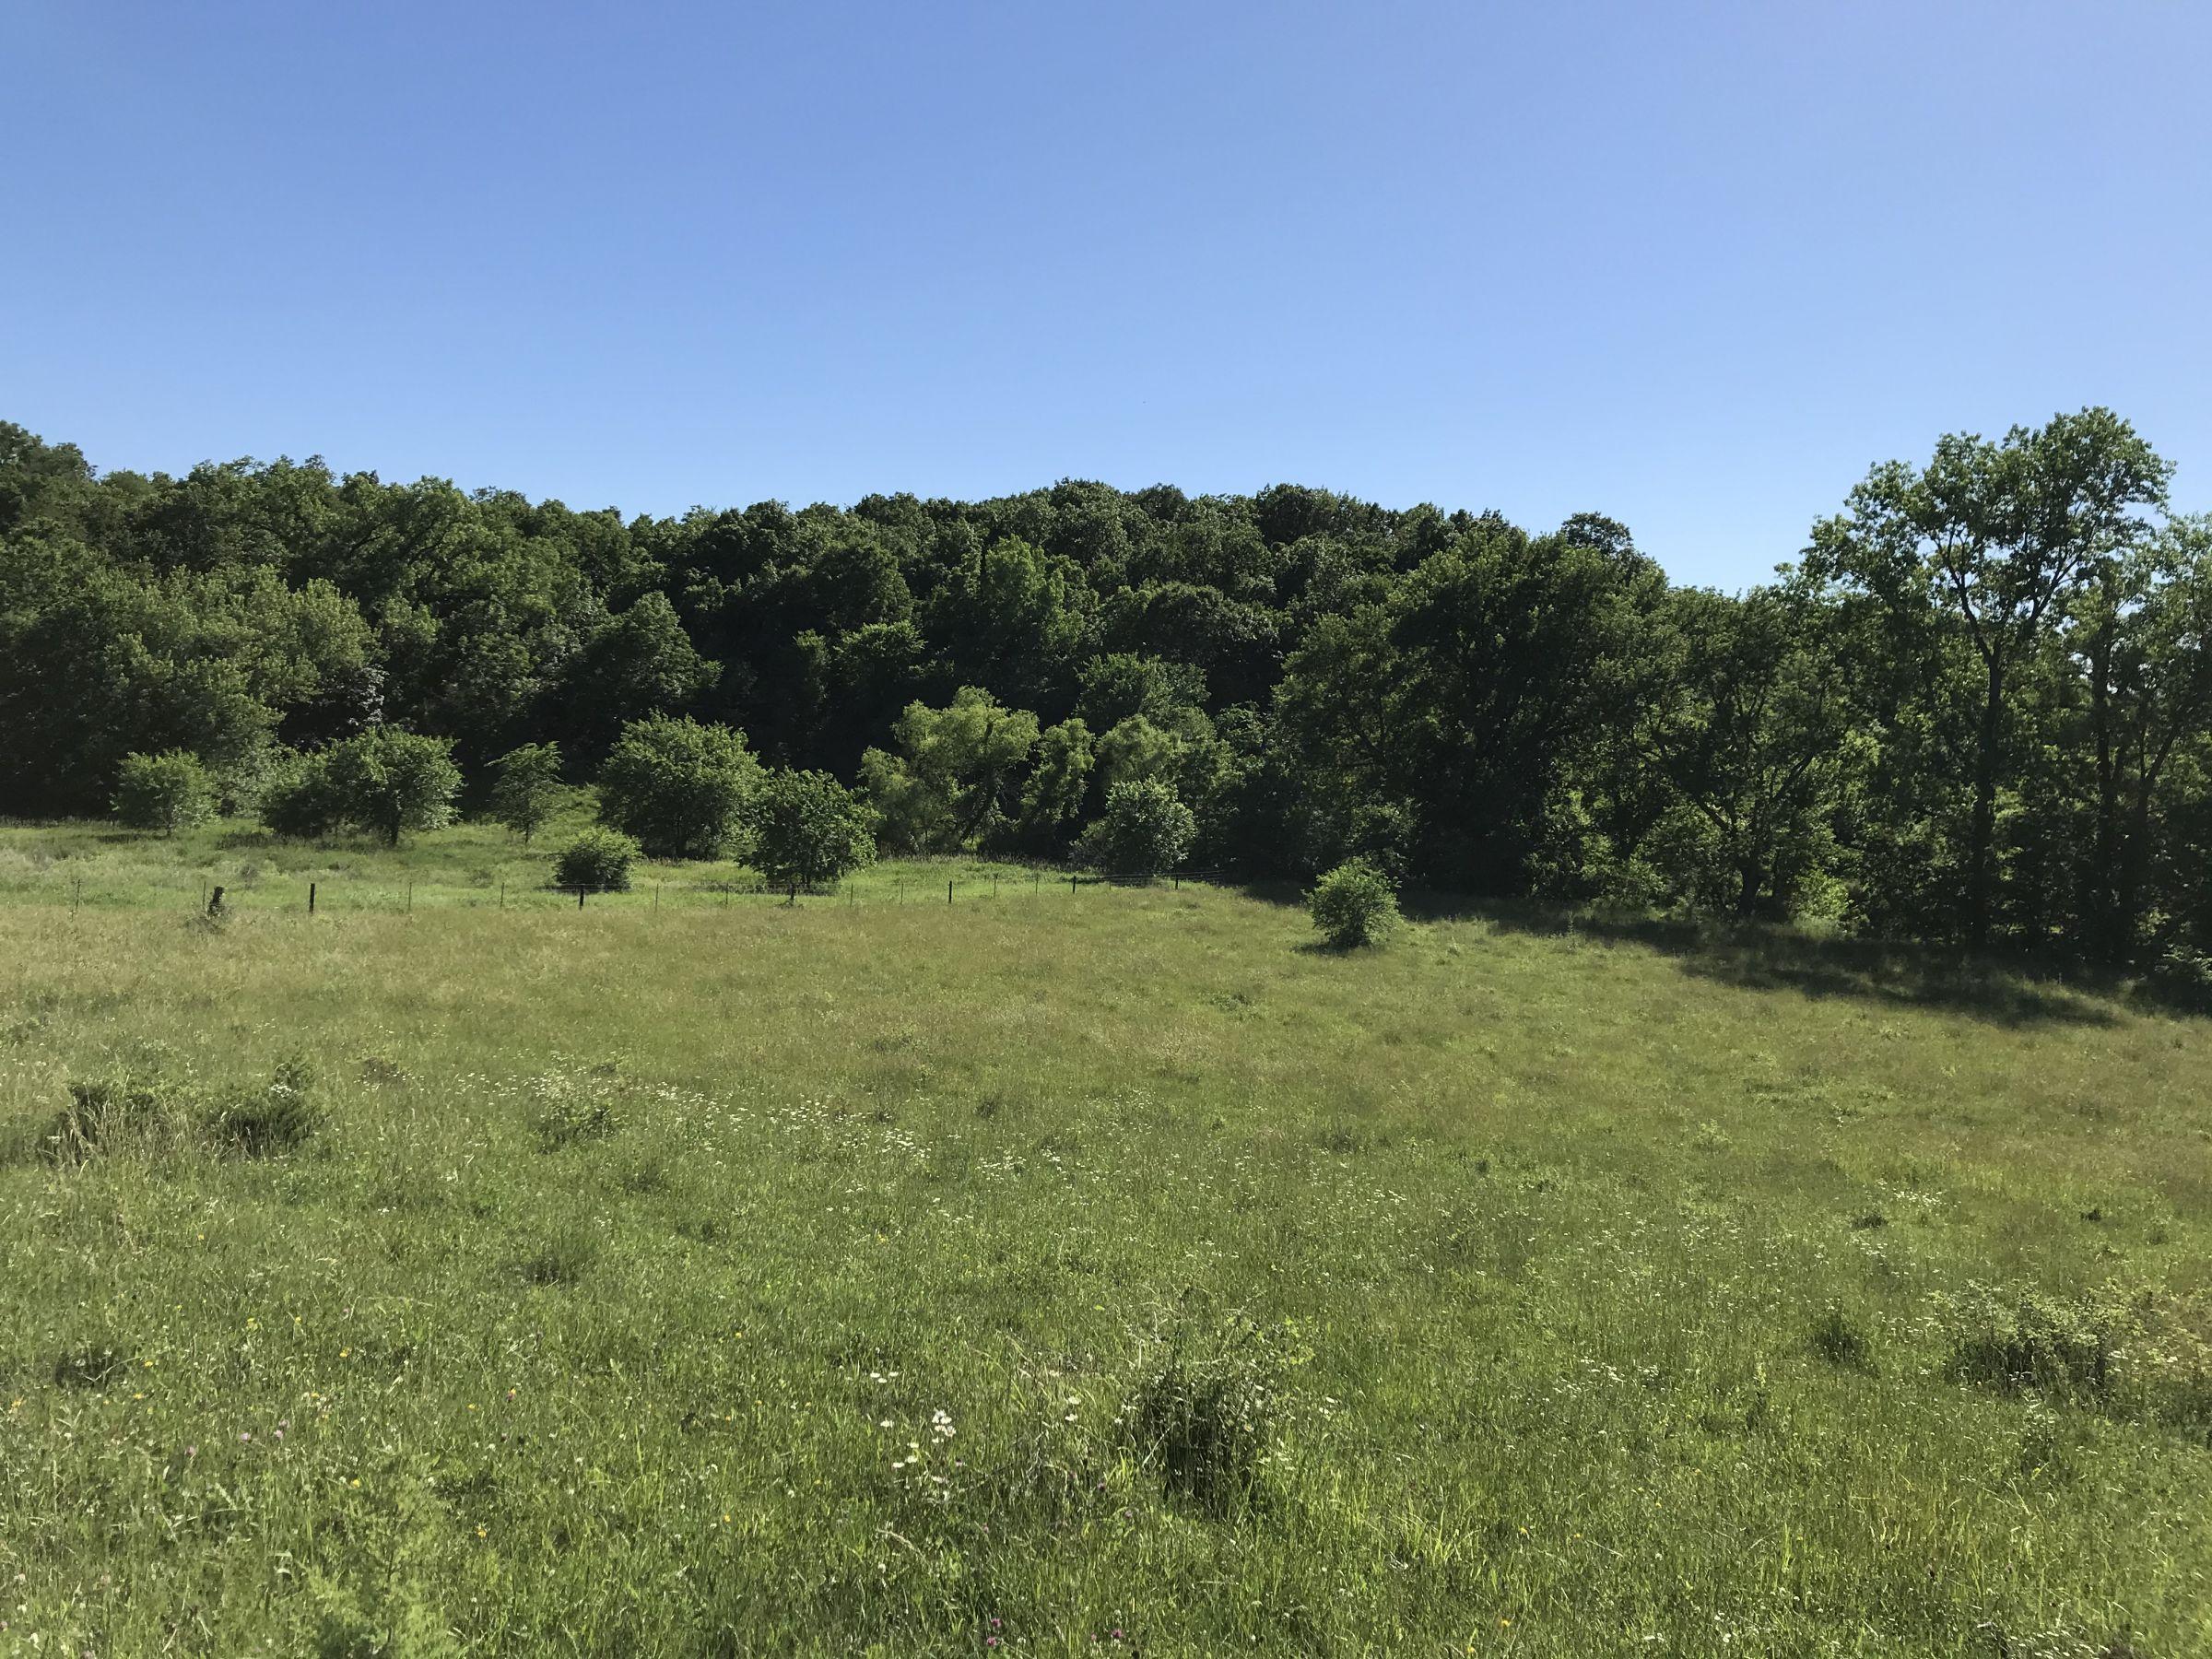 land-warren-county-iowa-60-acres-listing-number-15033-0-2020-06-14-151751.JPG